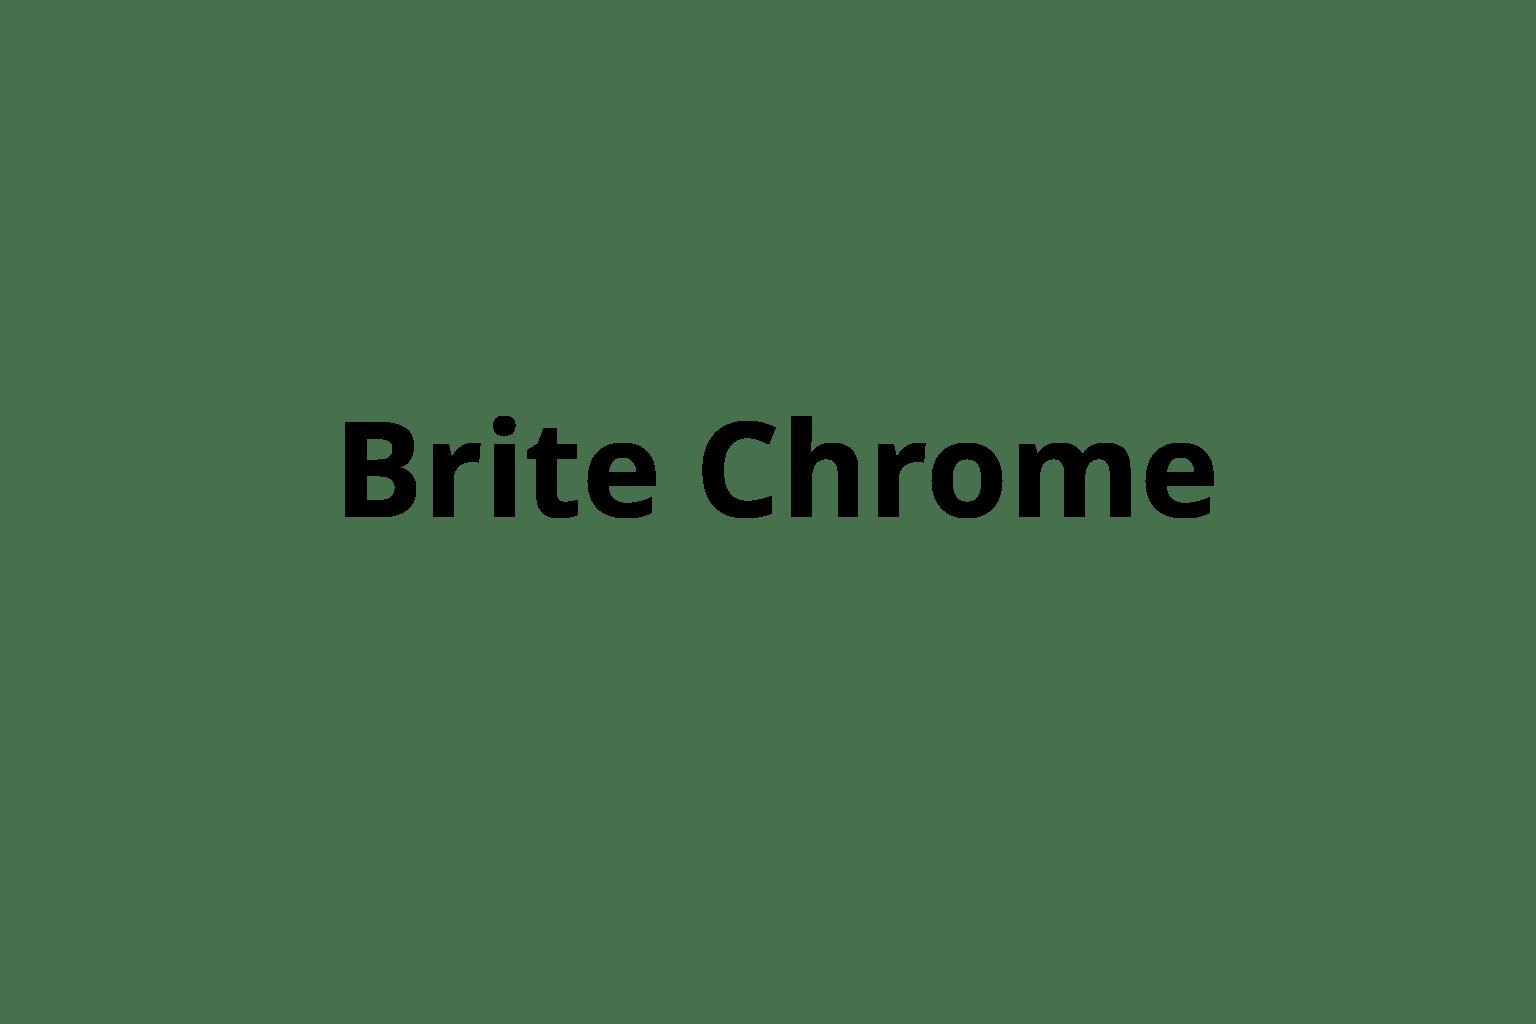 Brite Chrome